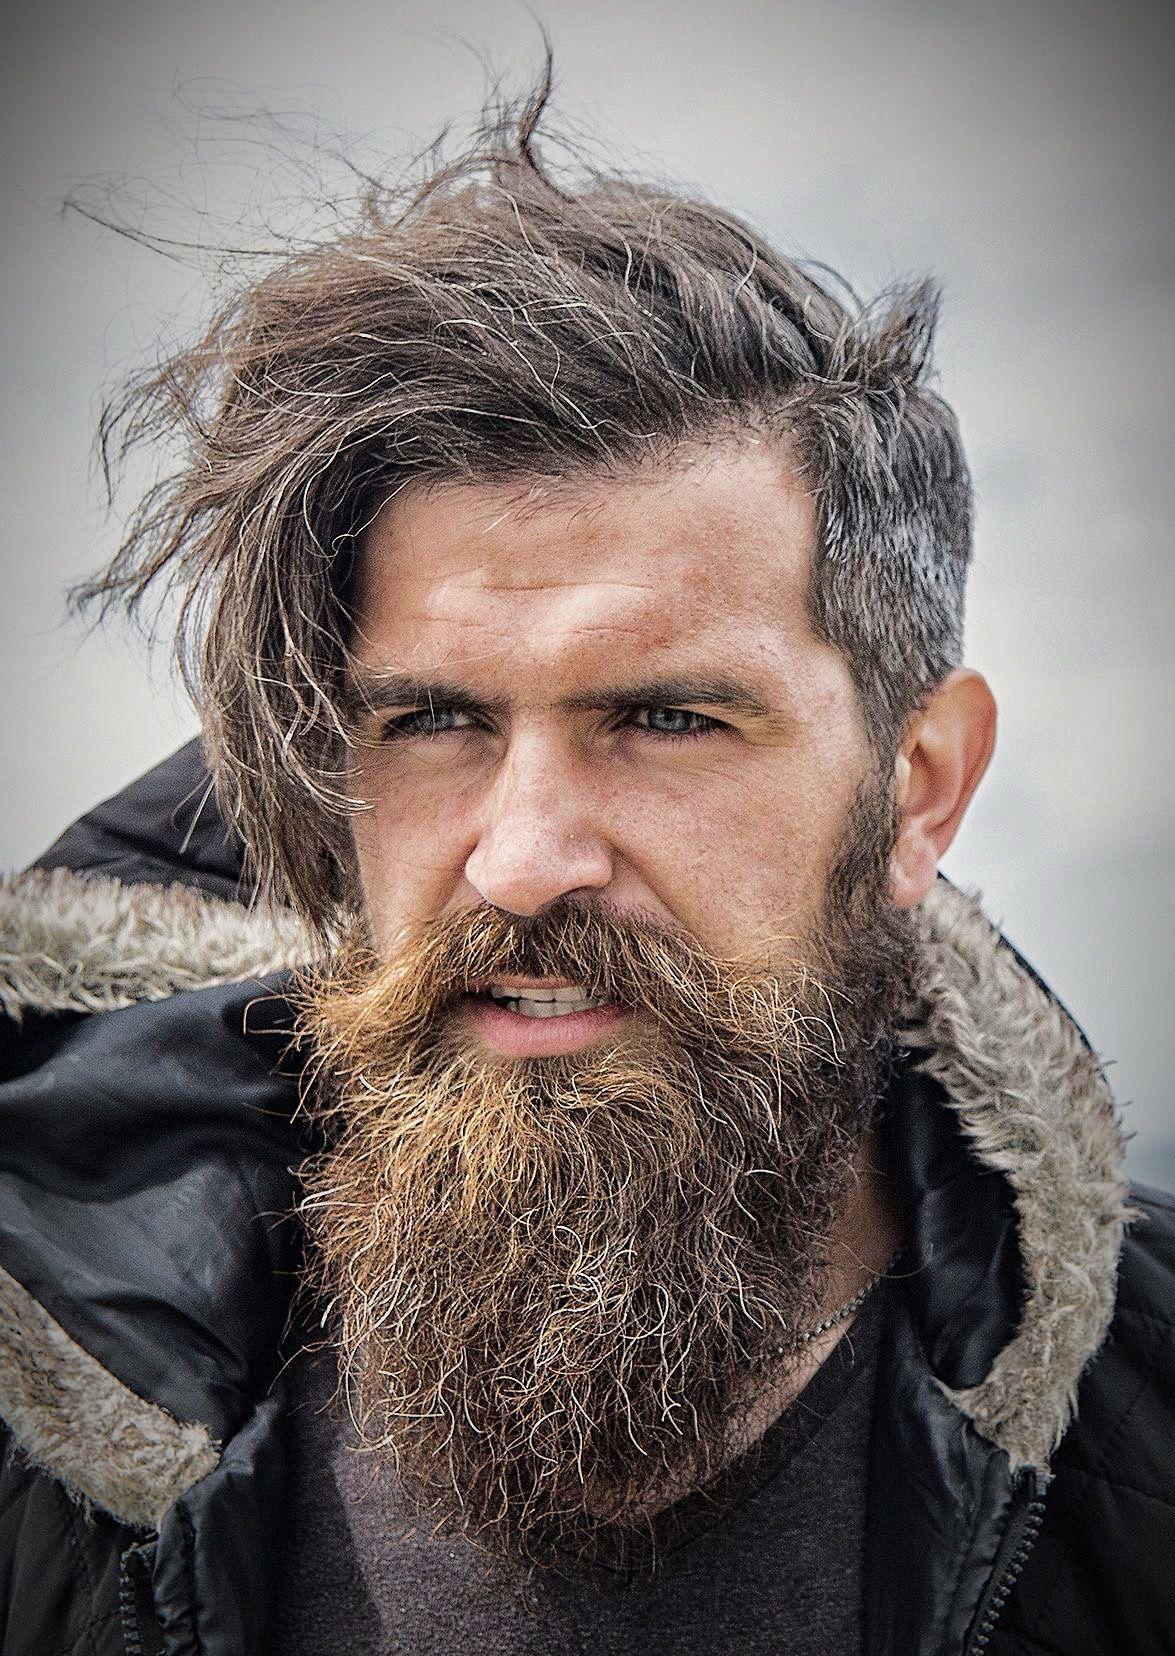 Haircuts for big foreheads men pin by bojan trobec on beard all over the world  pinterest  beard